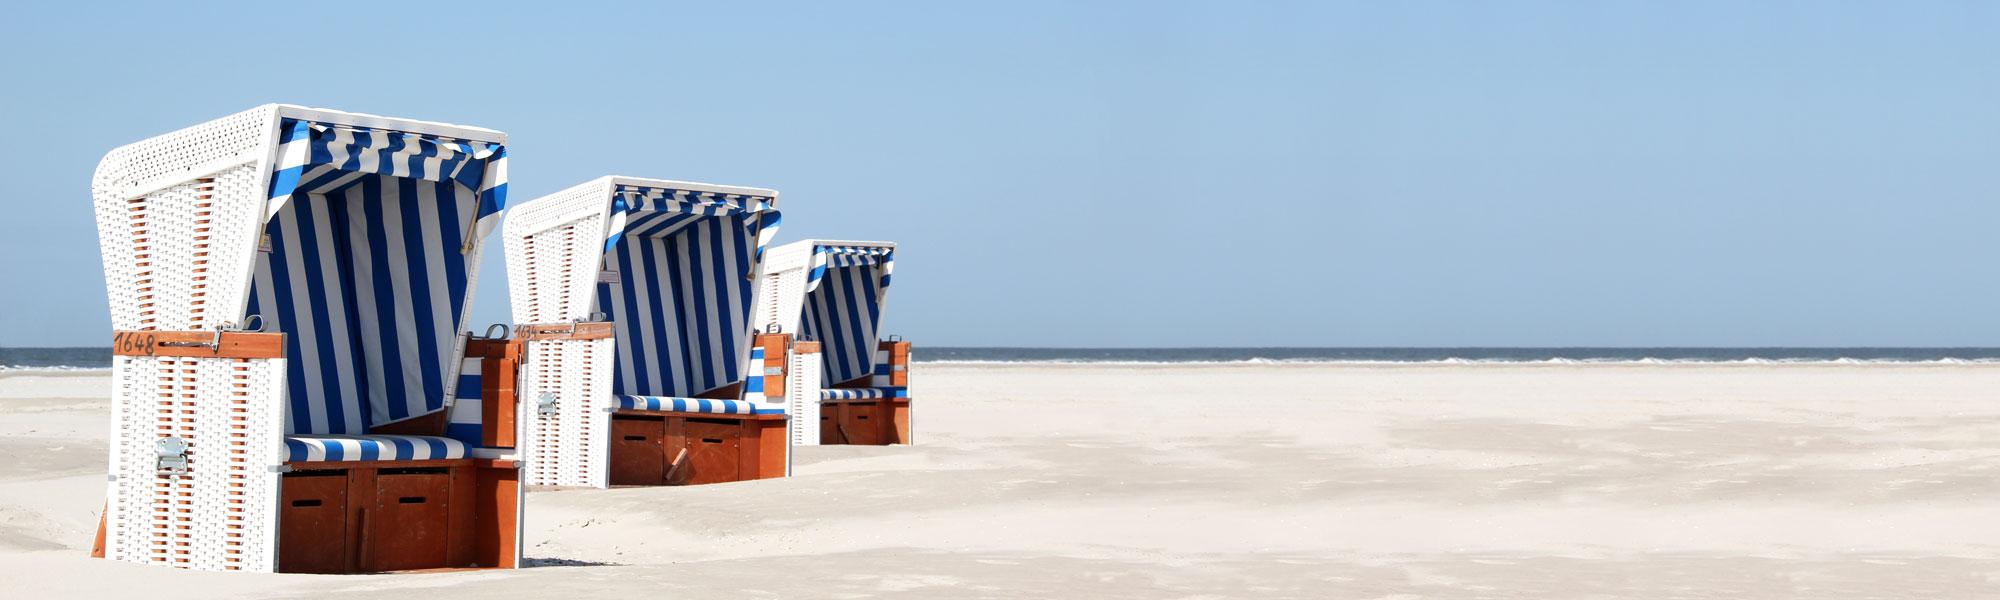 Strandkörbe - Reisekombi